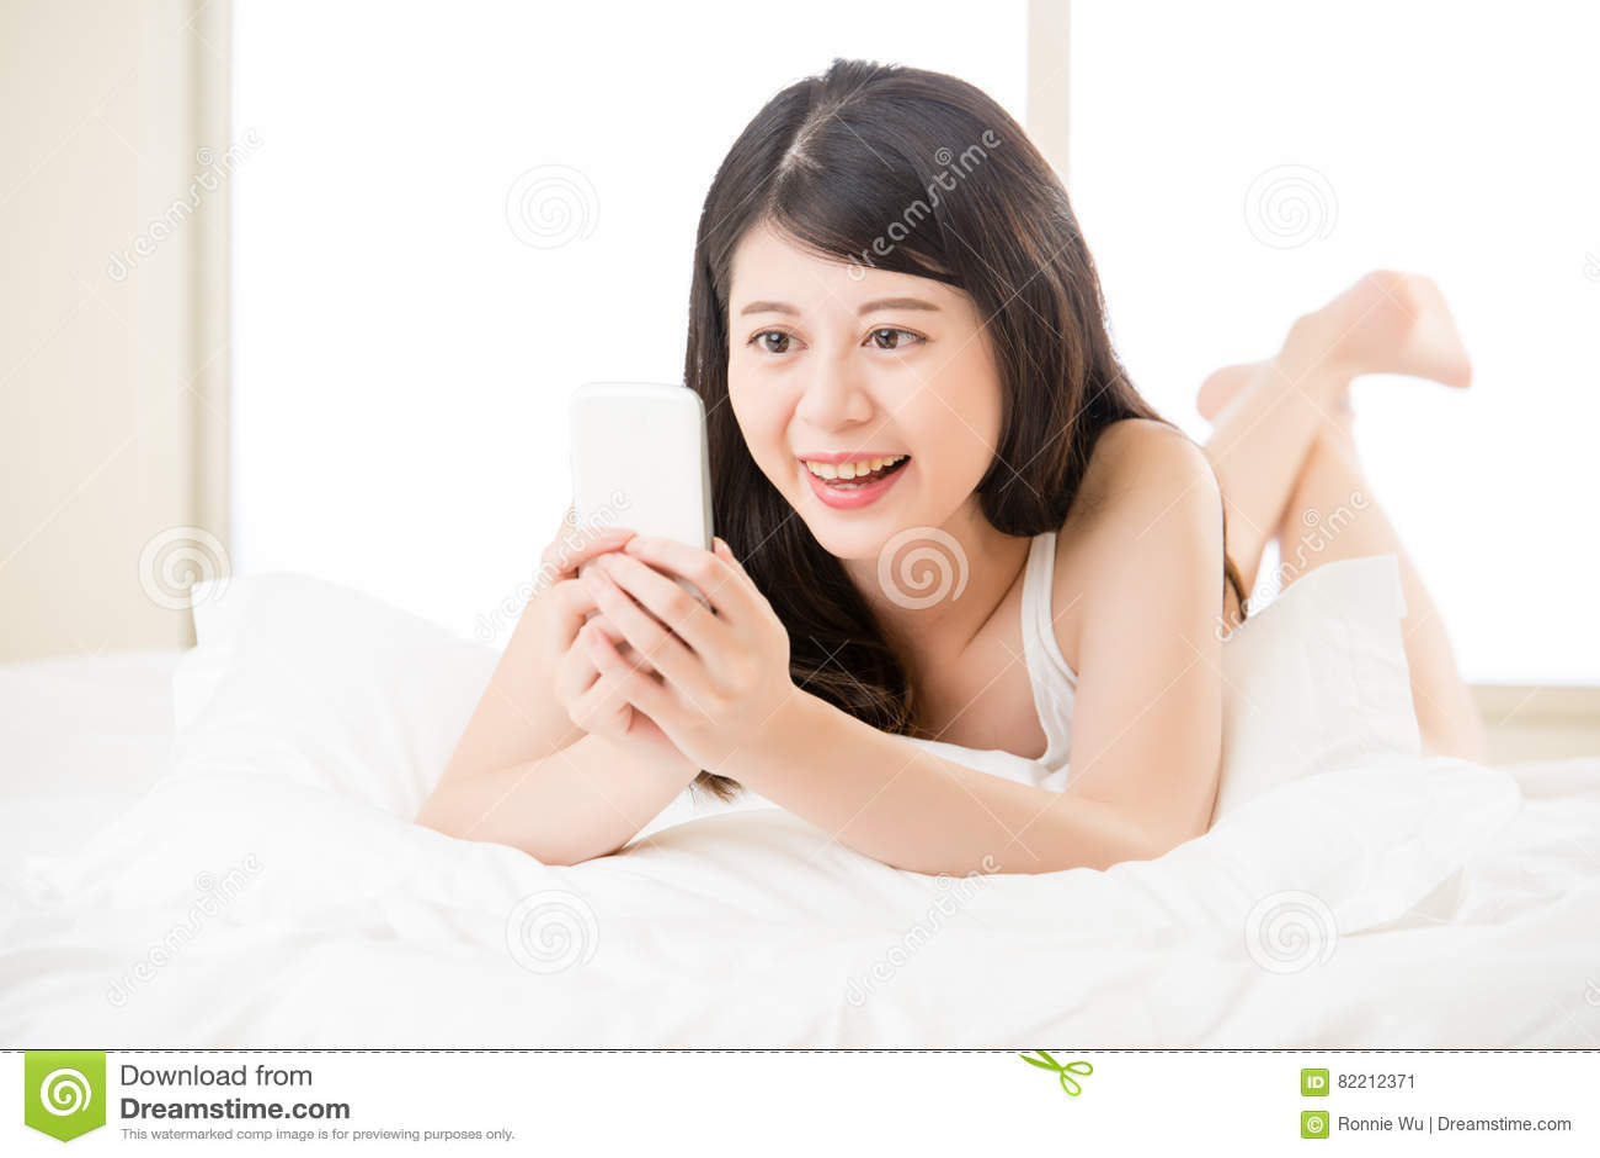 Old hot women porn